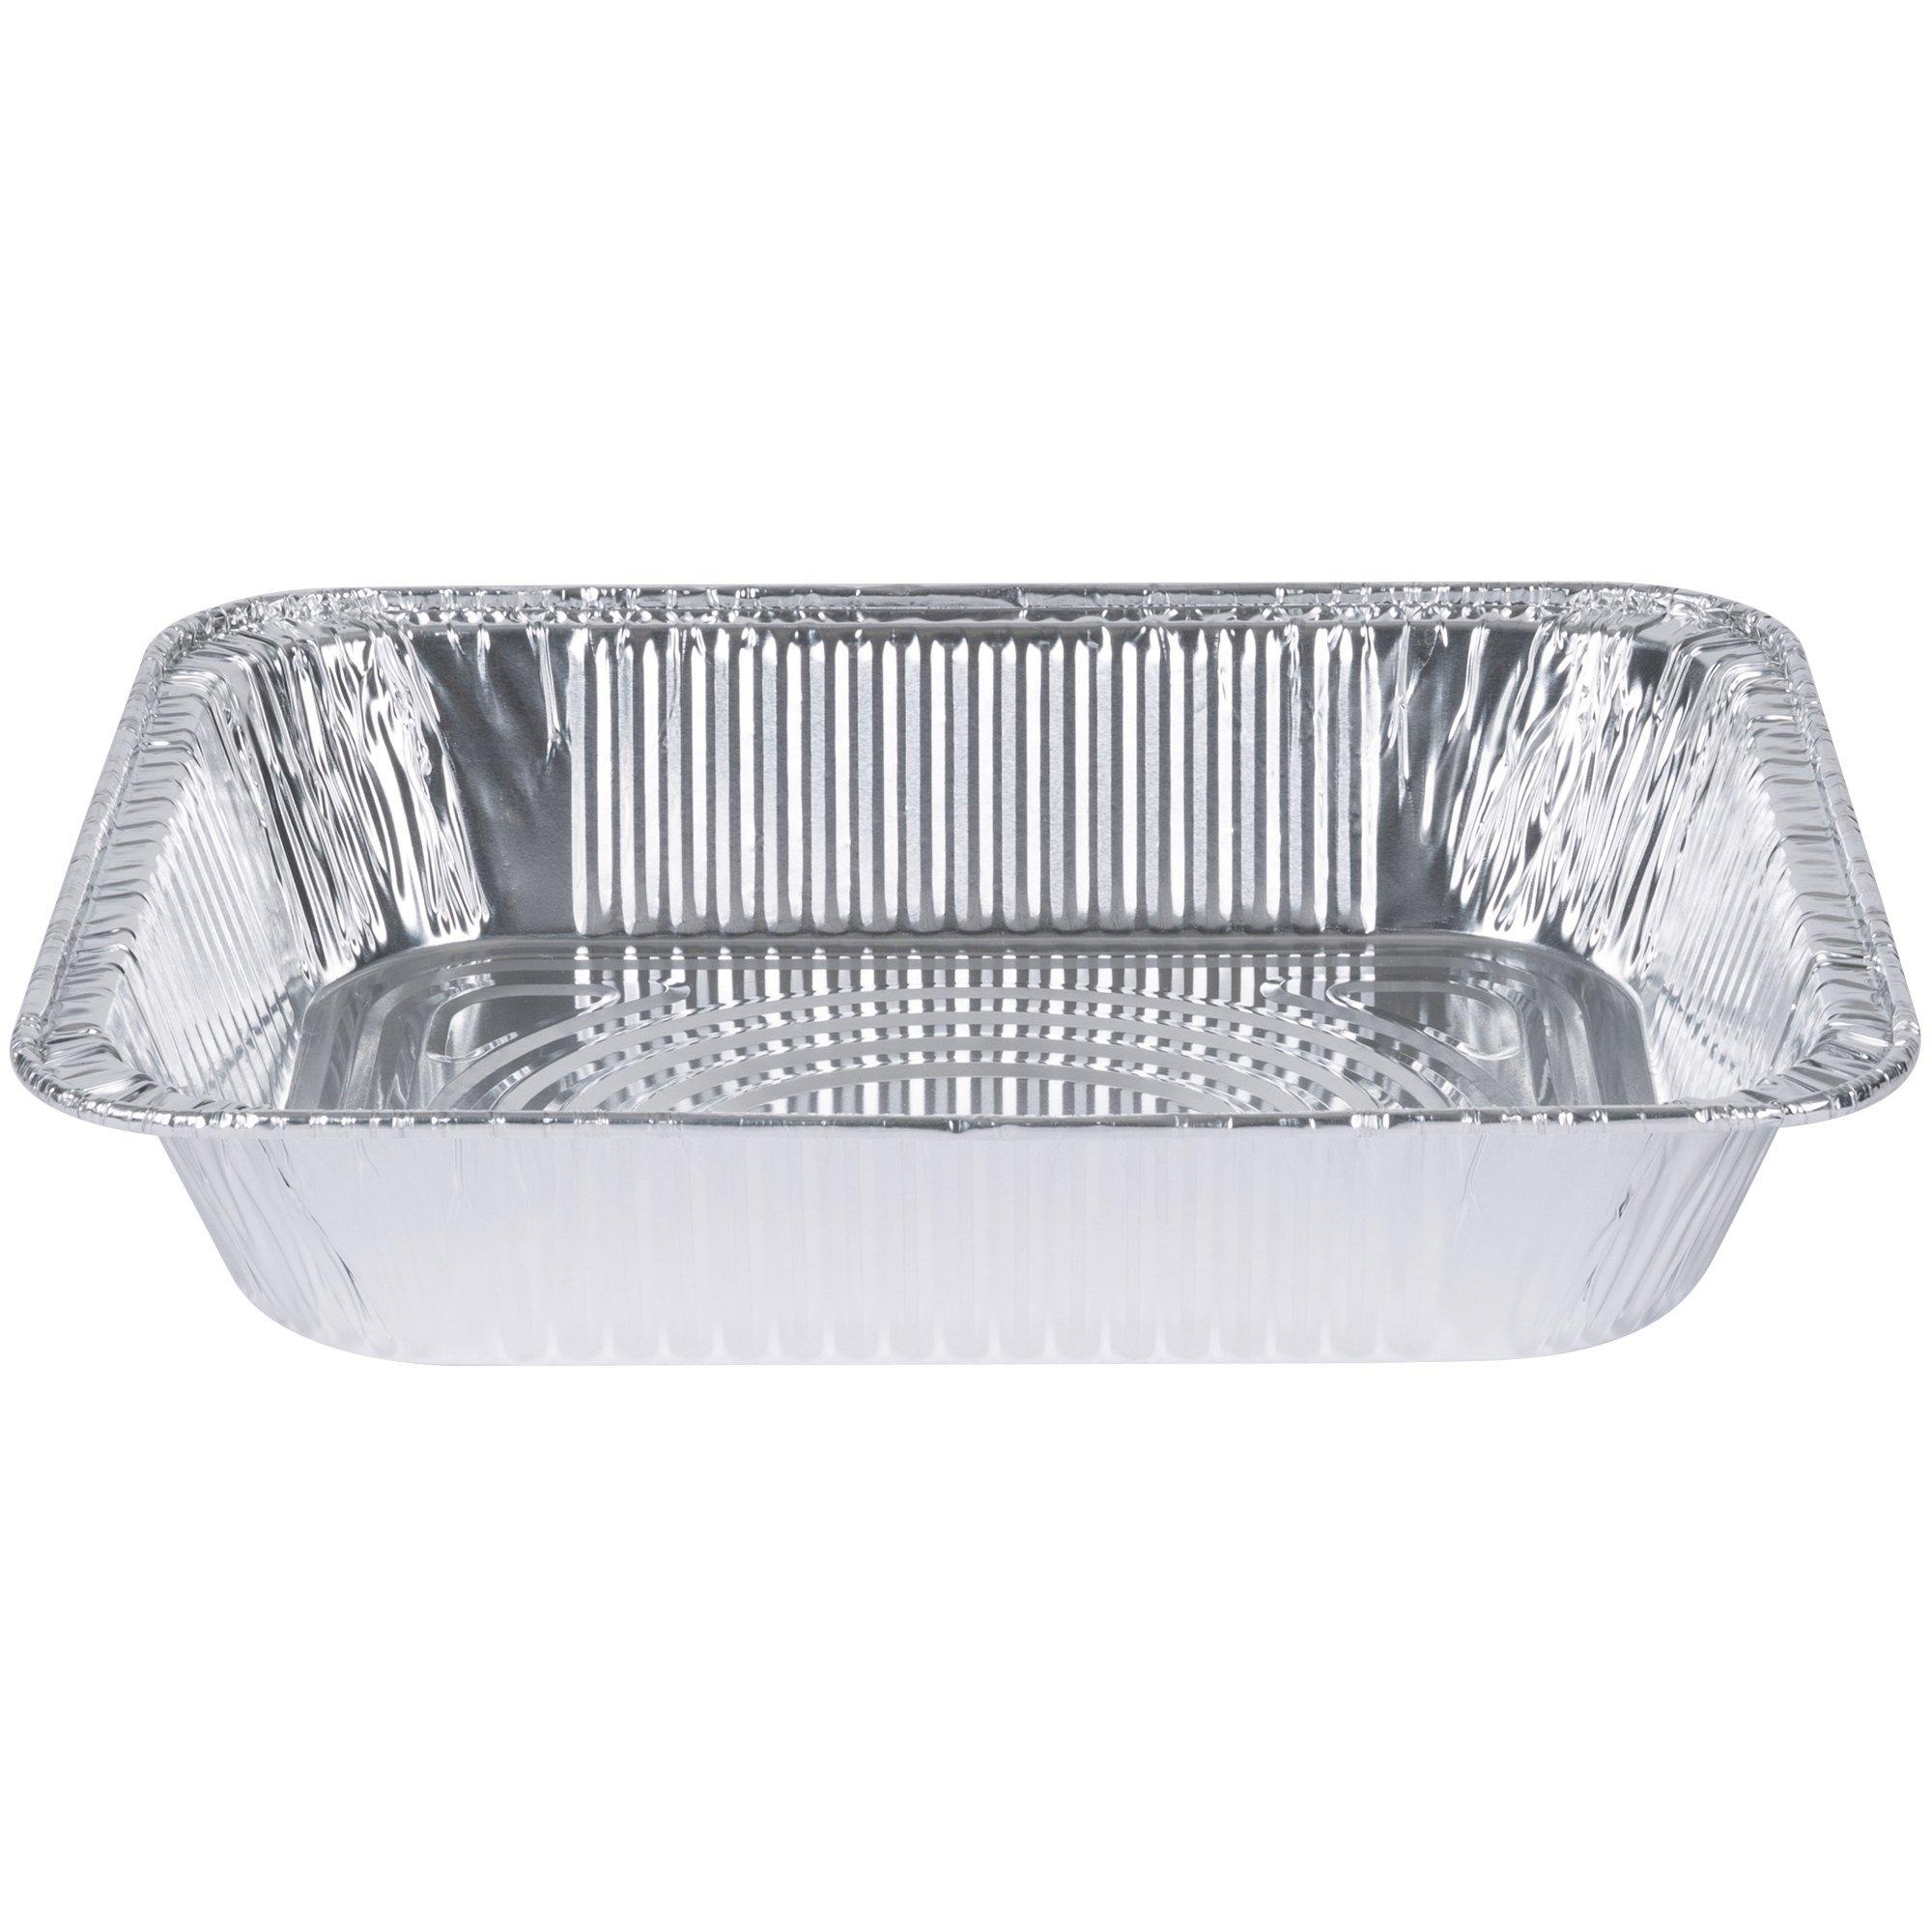 [30 Pack] 9 x 13 Aluminum Foil Pans Half Size Deep Steam Table Pans by Comfy Package (Image #2)